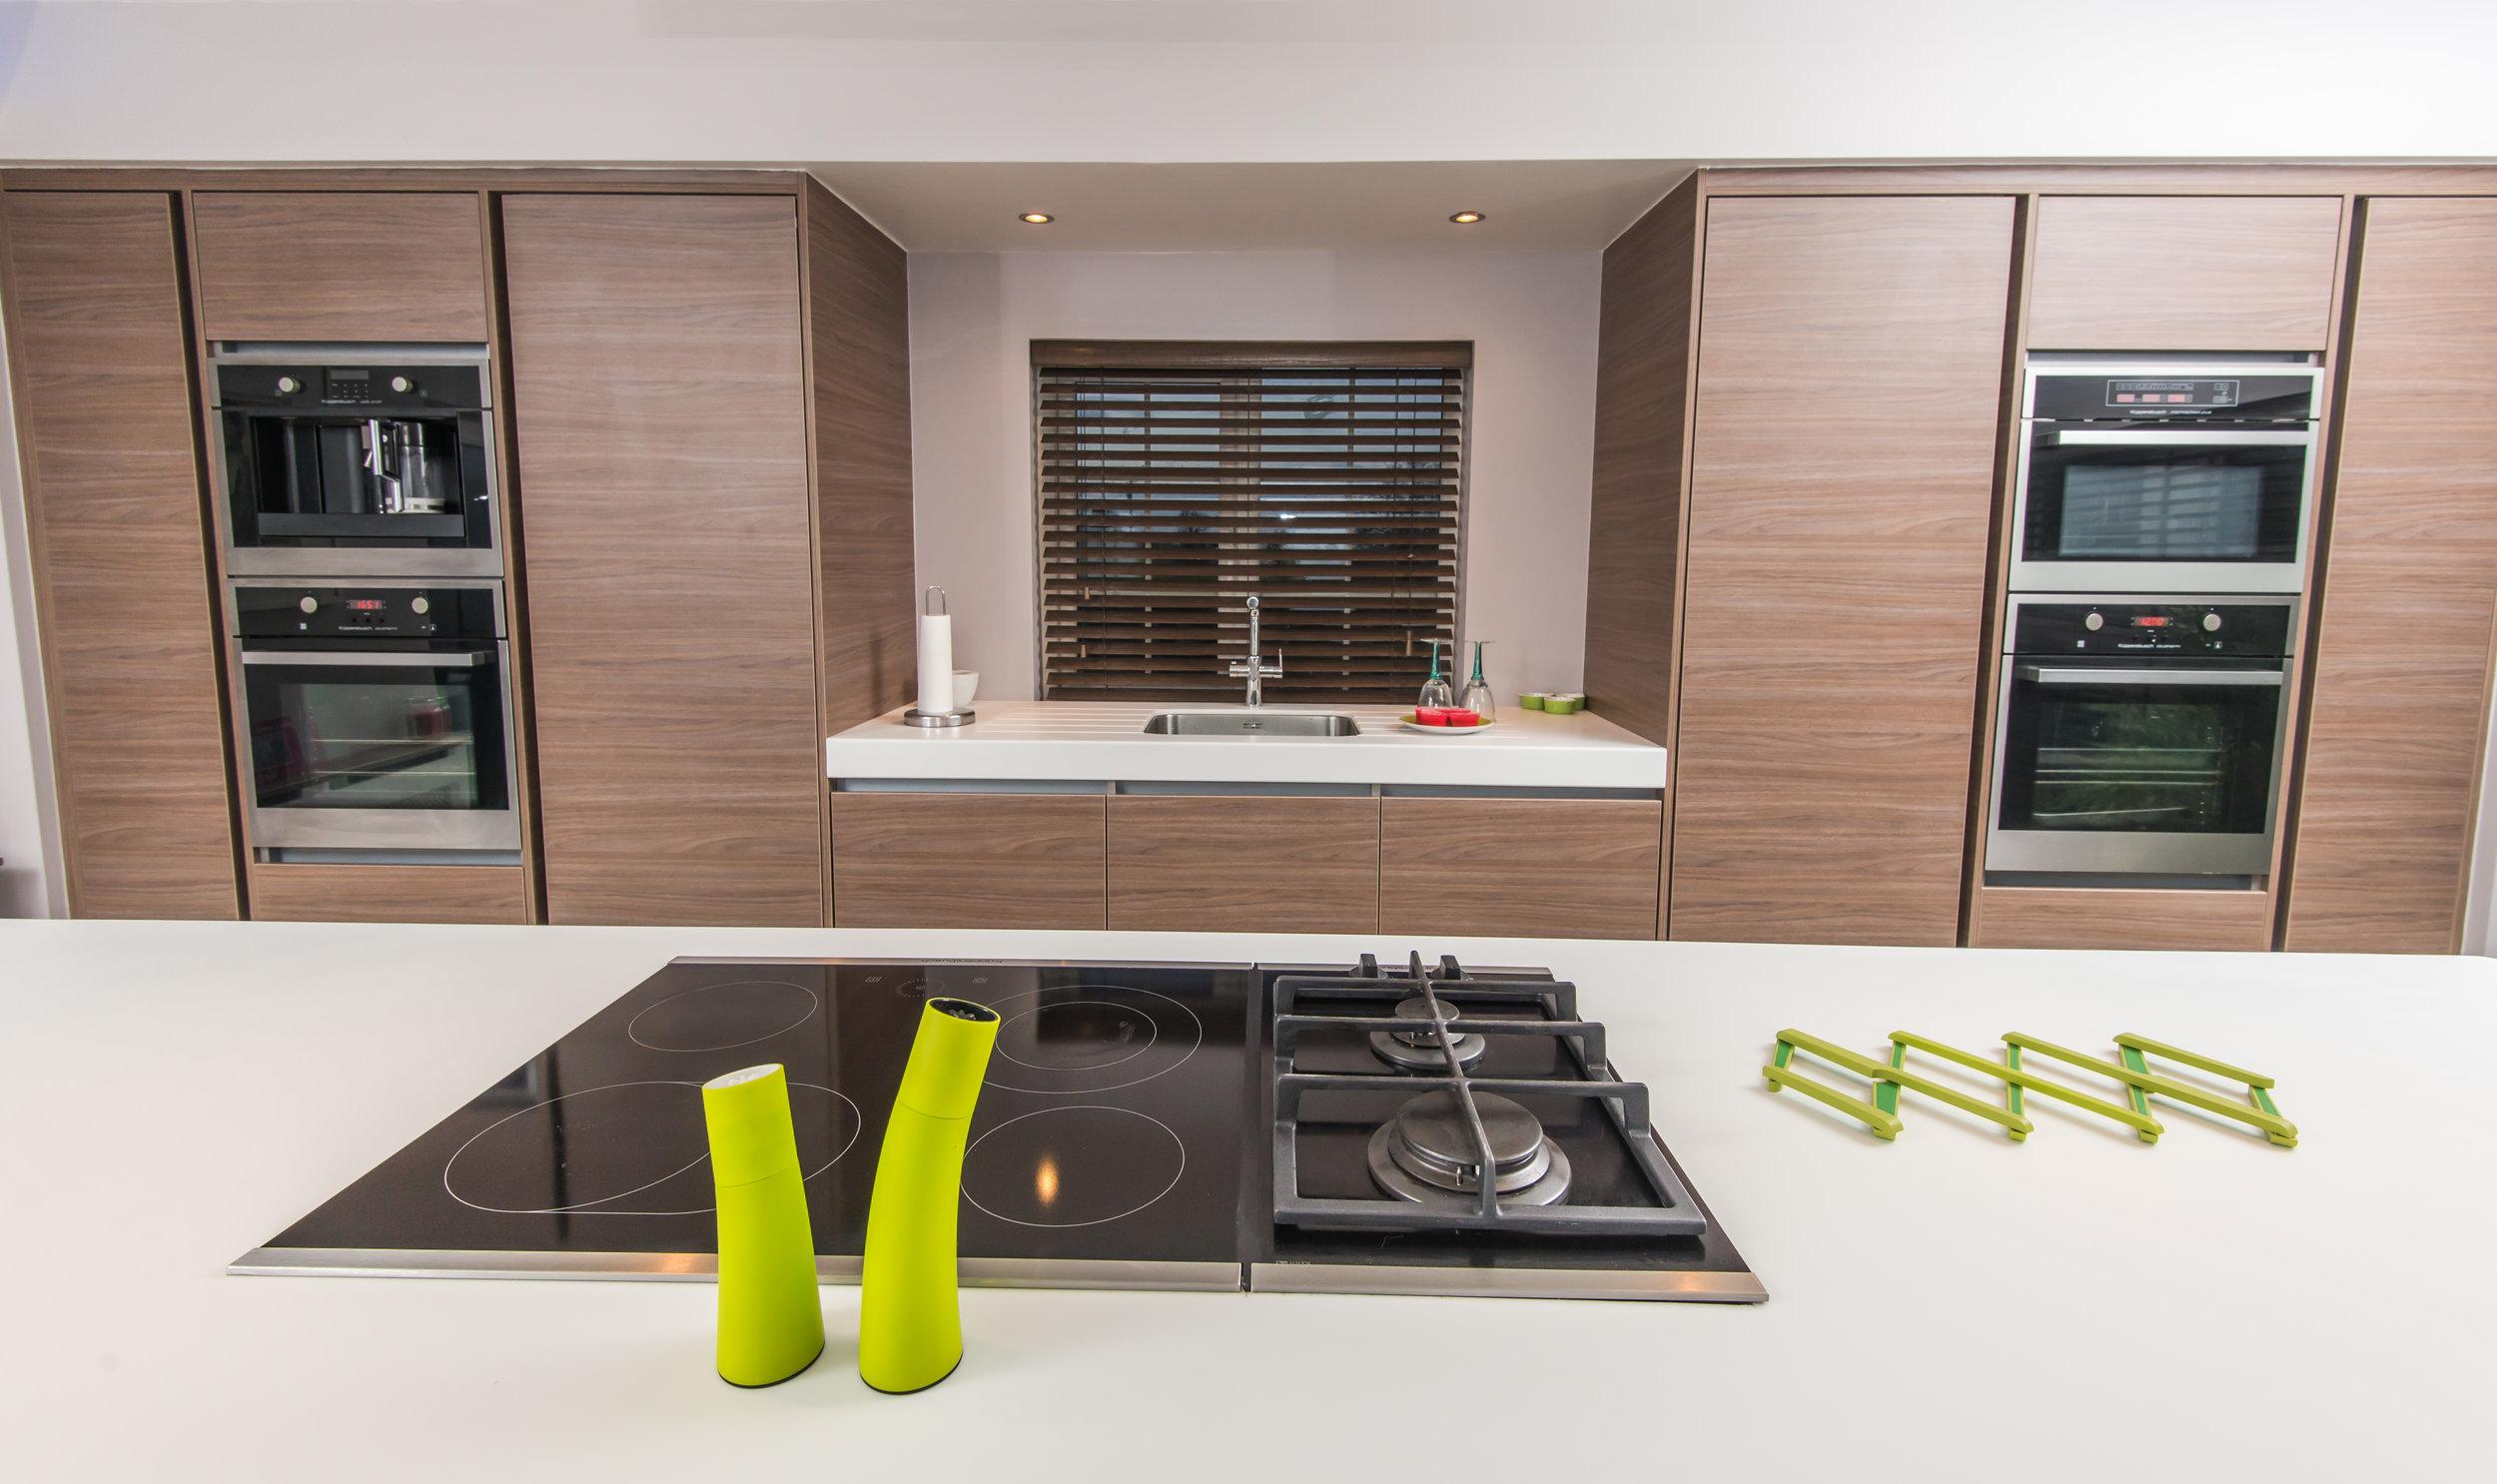 PH -004 -Corian kitchen.JPG